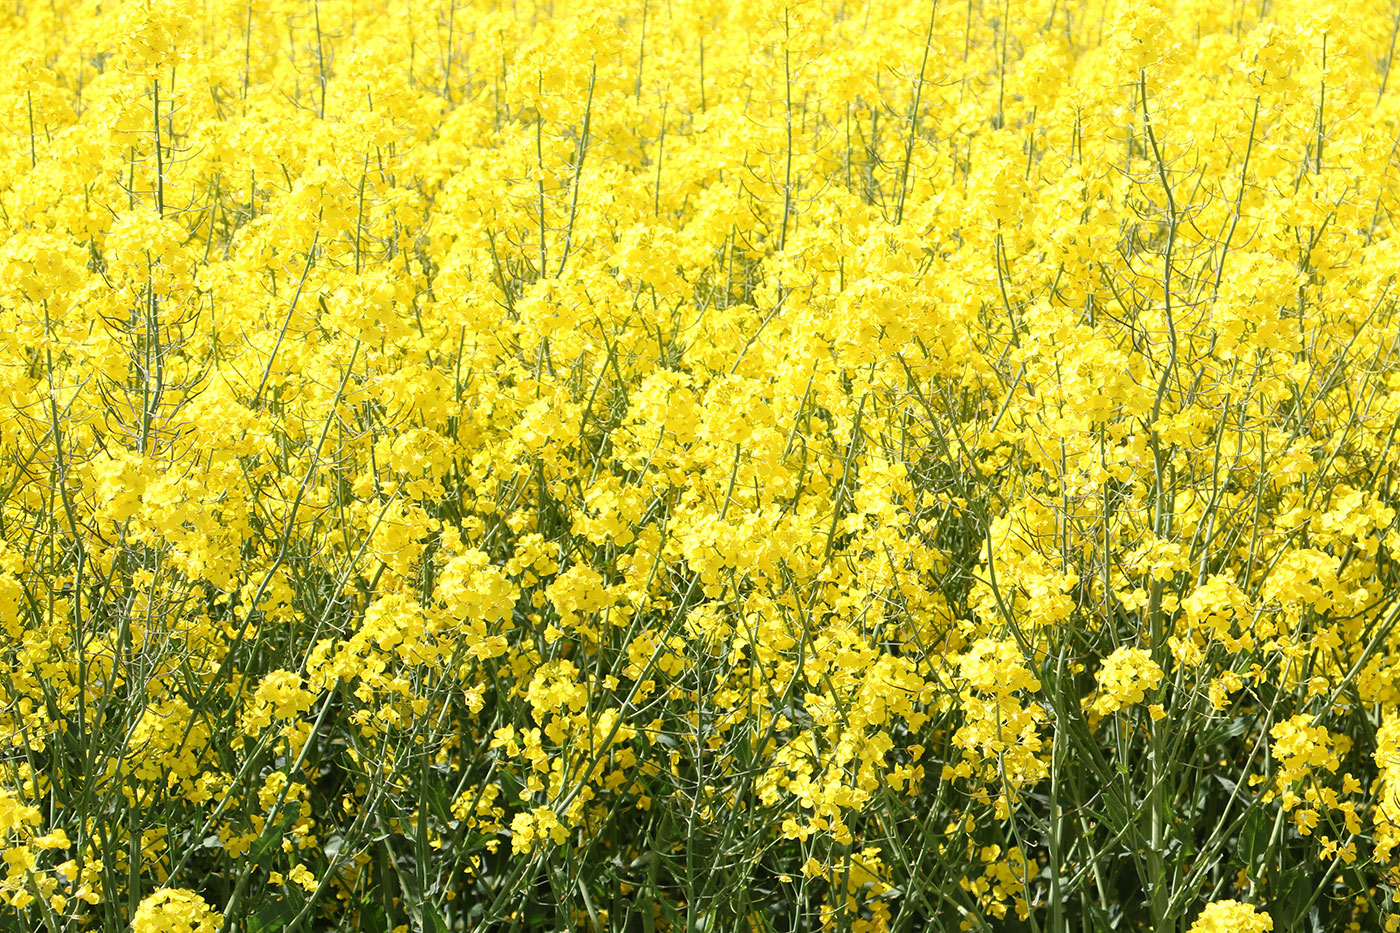 rapsfält, gula blommor